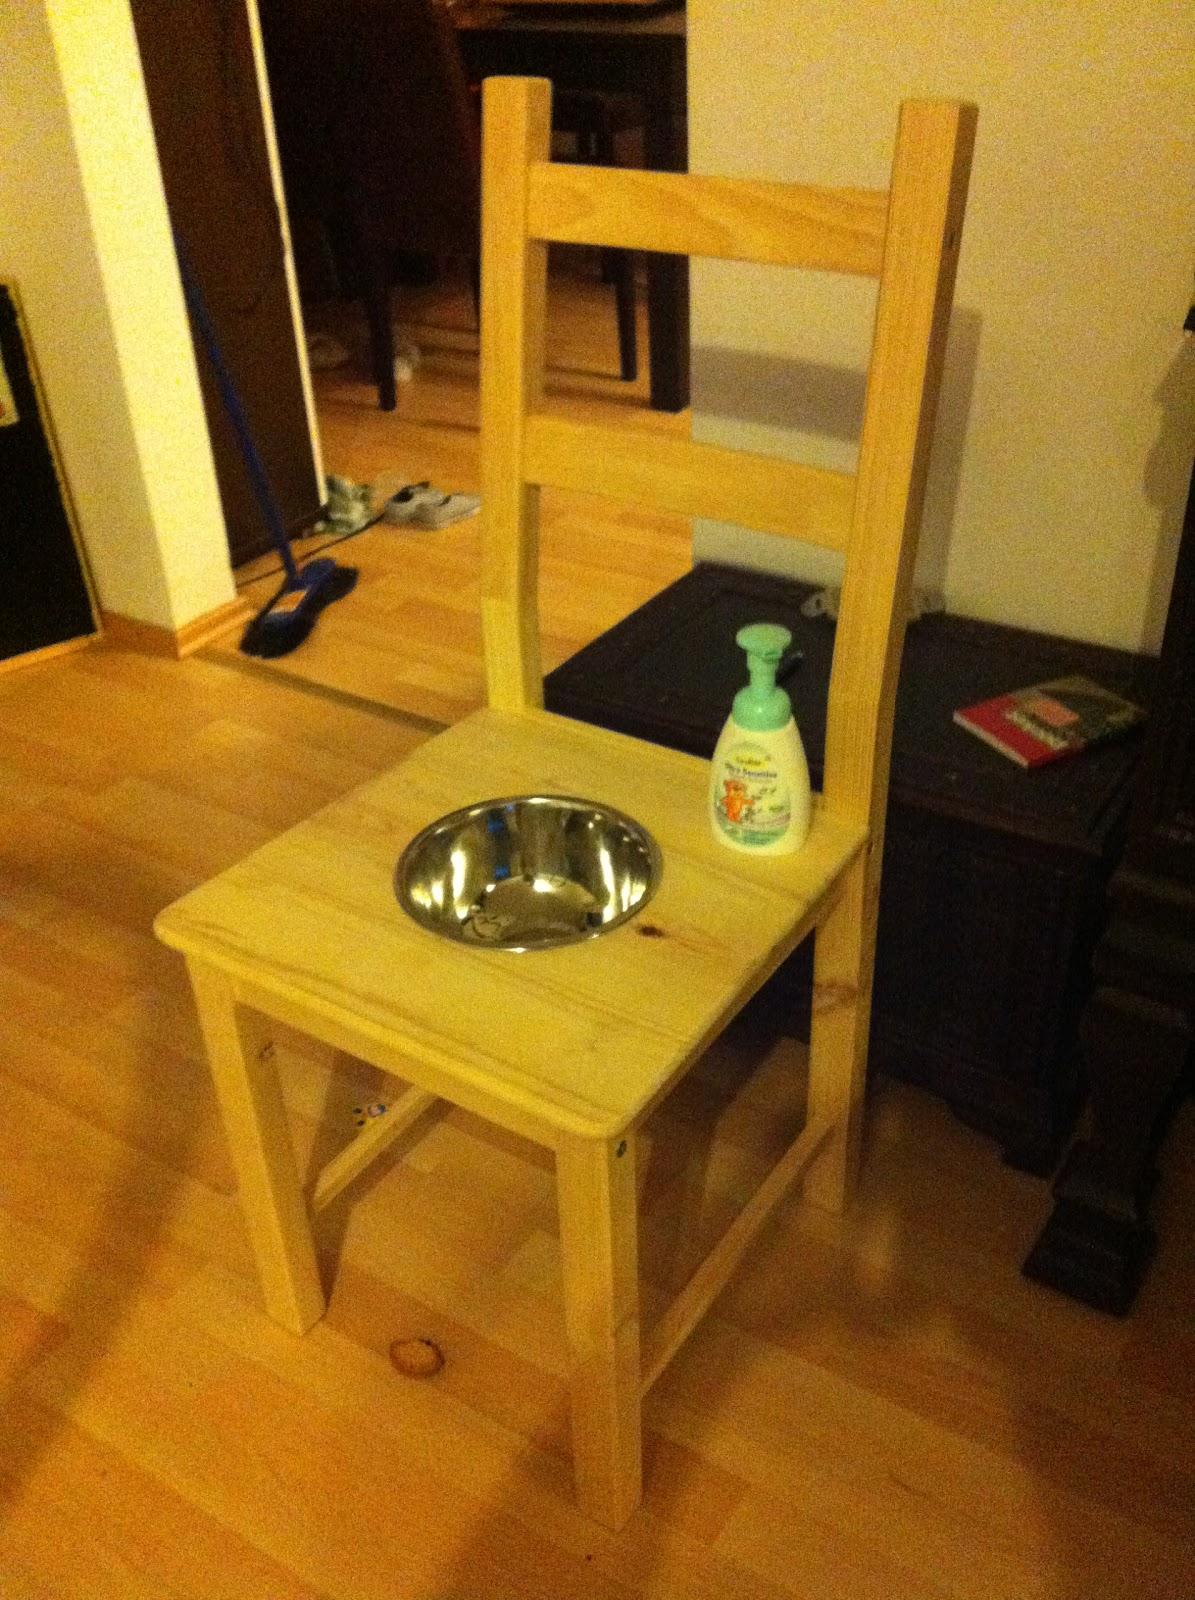 ha h ndmade waschstuhl ha h ndmade mit holz klappts auch. Black Bedroom Furniture Sets. Home Design Ideas